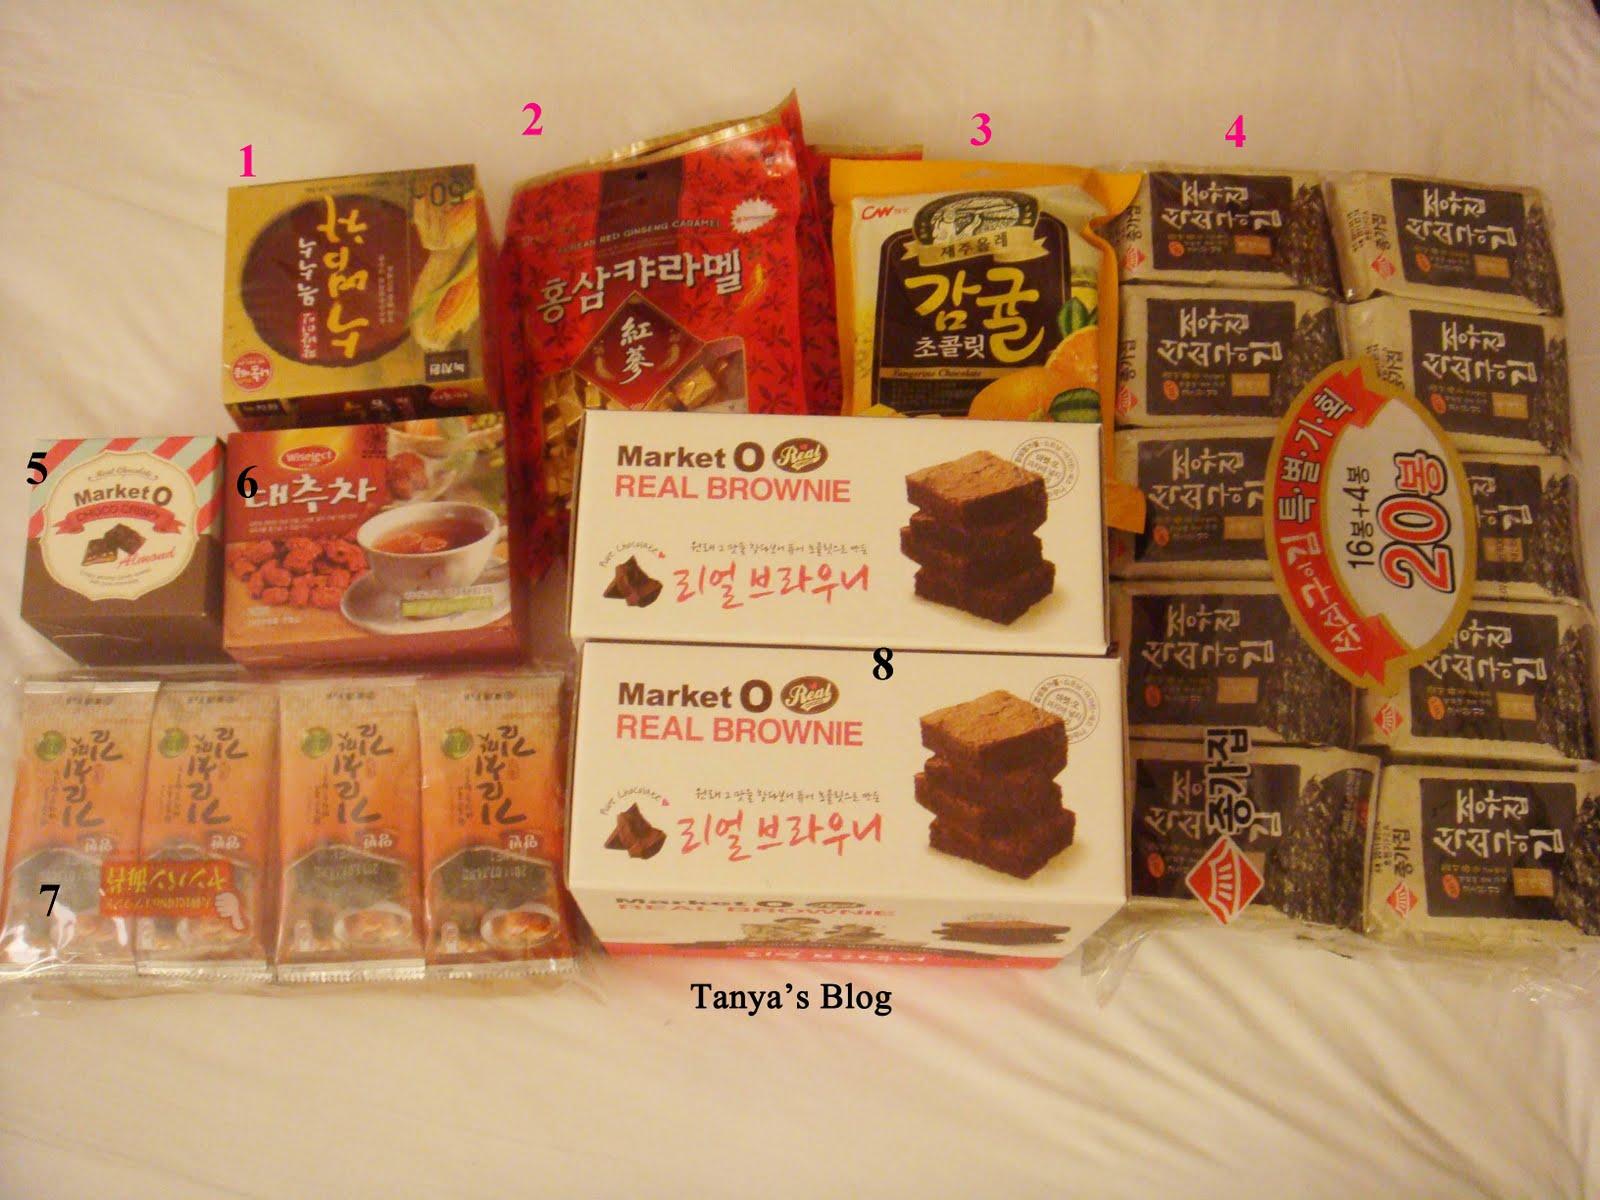 Tanya's Blog: 2011 韓國 首爾 自由自助行之樂天超市篇-零食